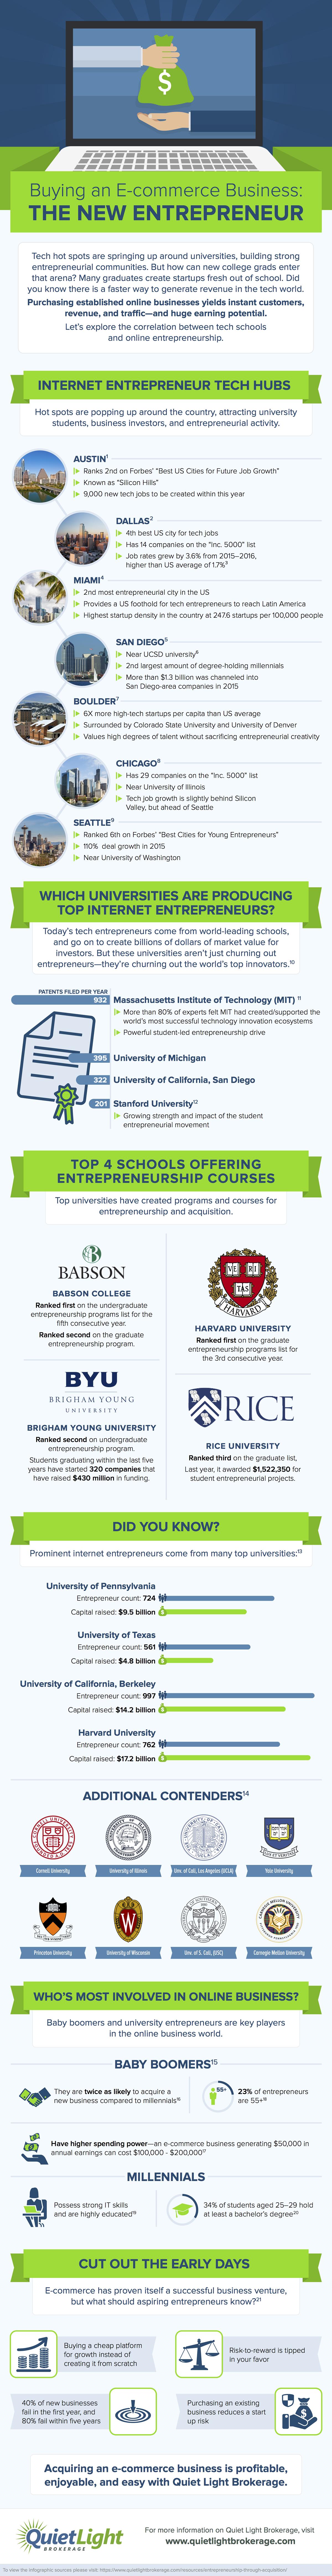 Buying An E Commerce Business: The New Entrepreneur #Infographic #Business  #Entrepreneur